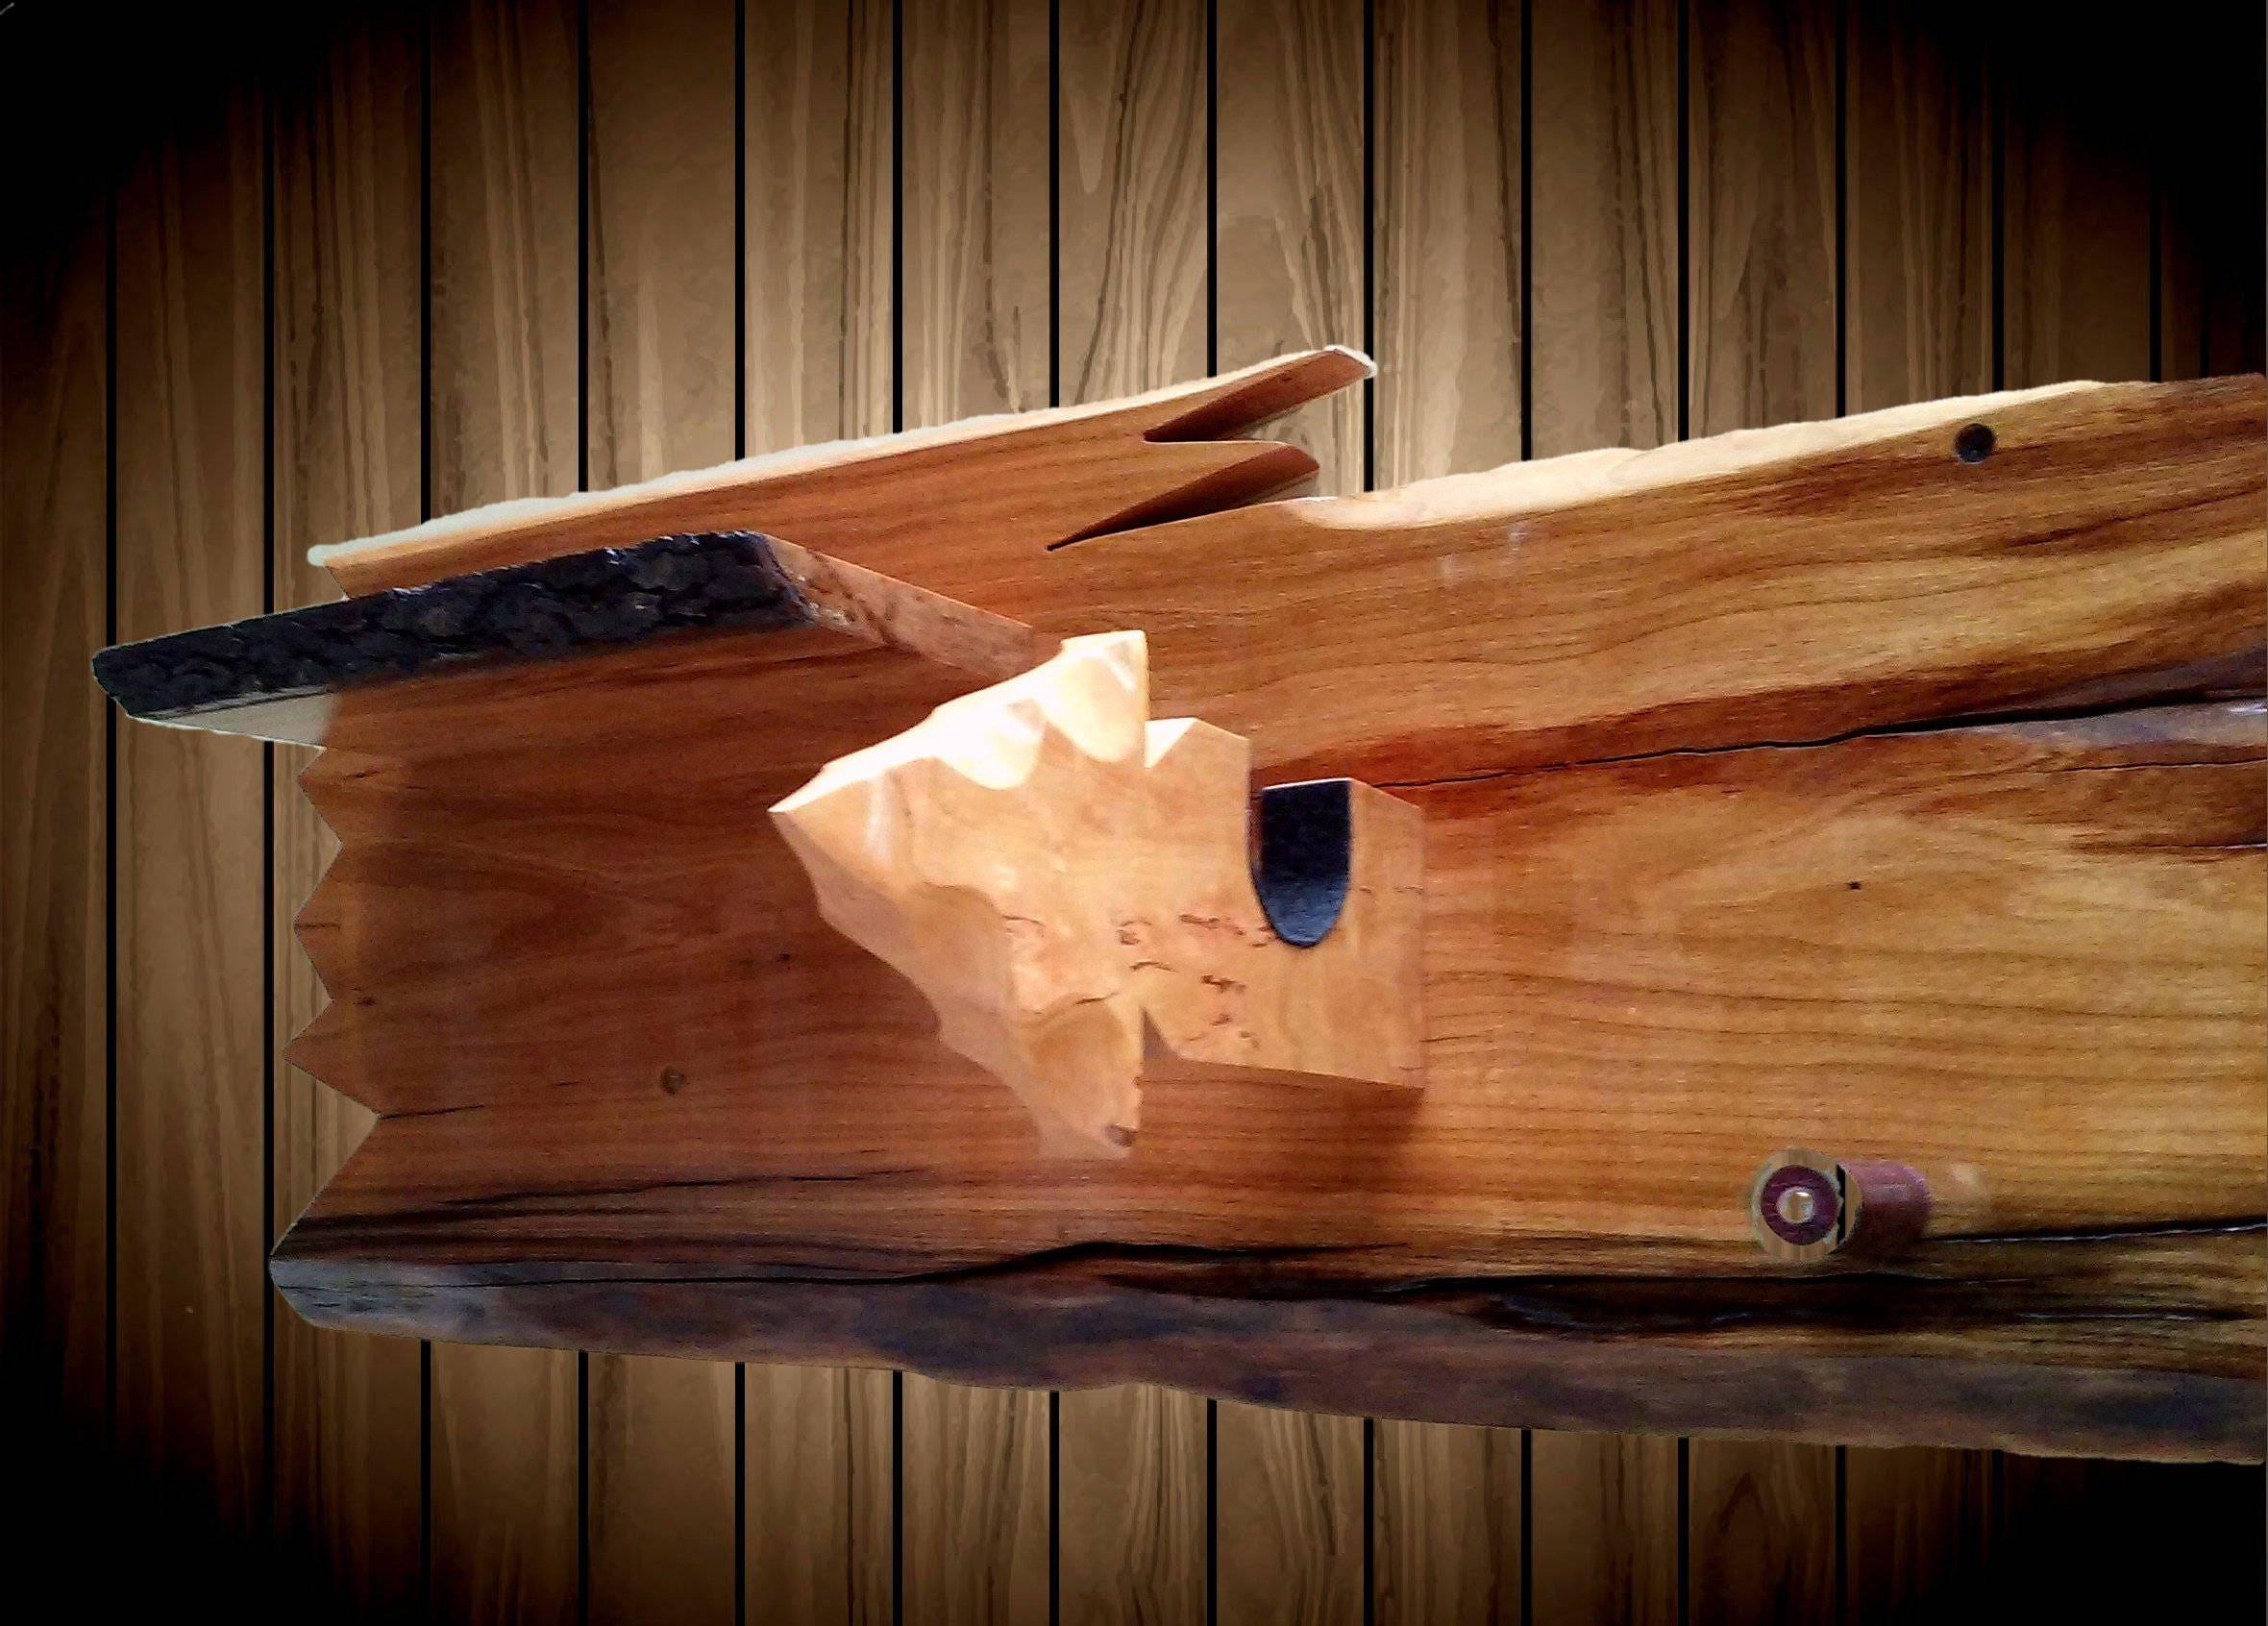 Rustic Live Edge Cherry Wood Wall Gun Rack Shelf Shotgun